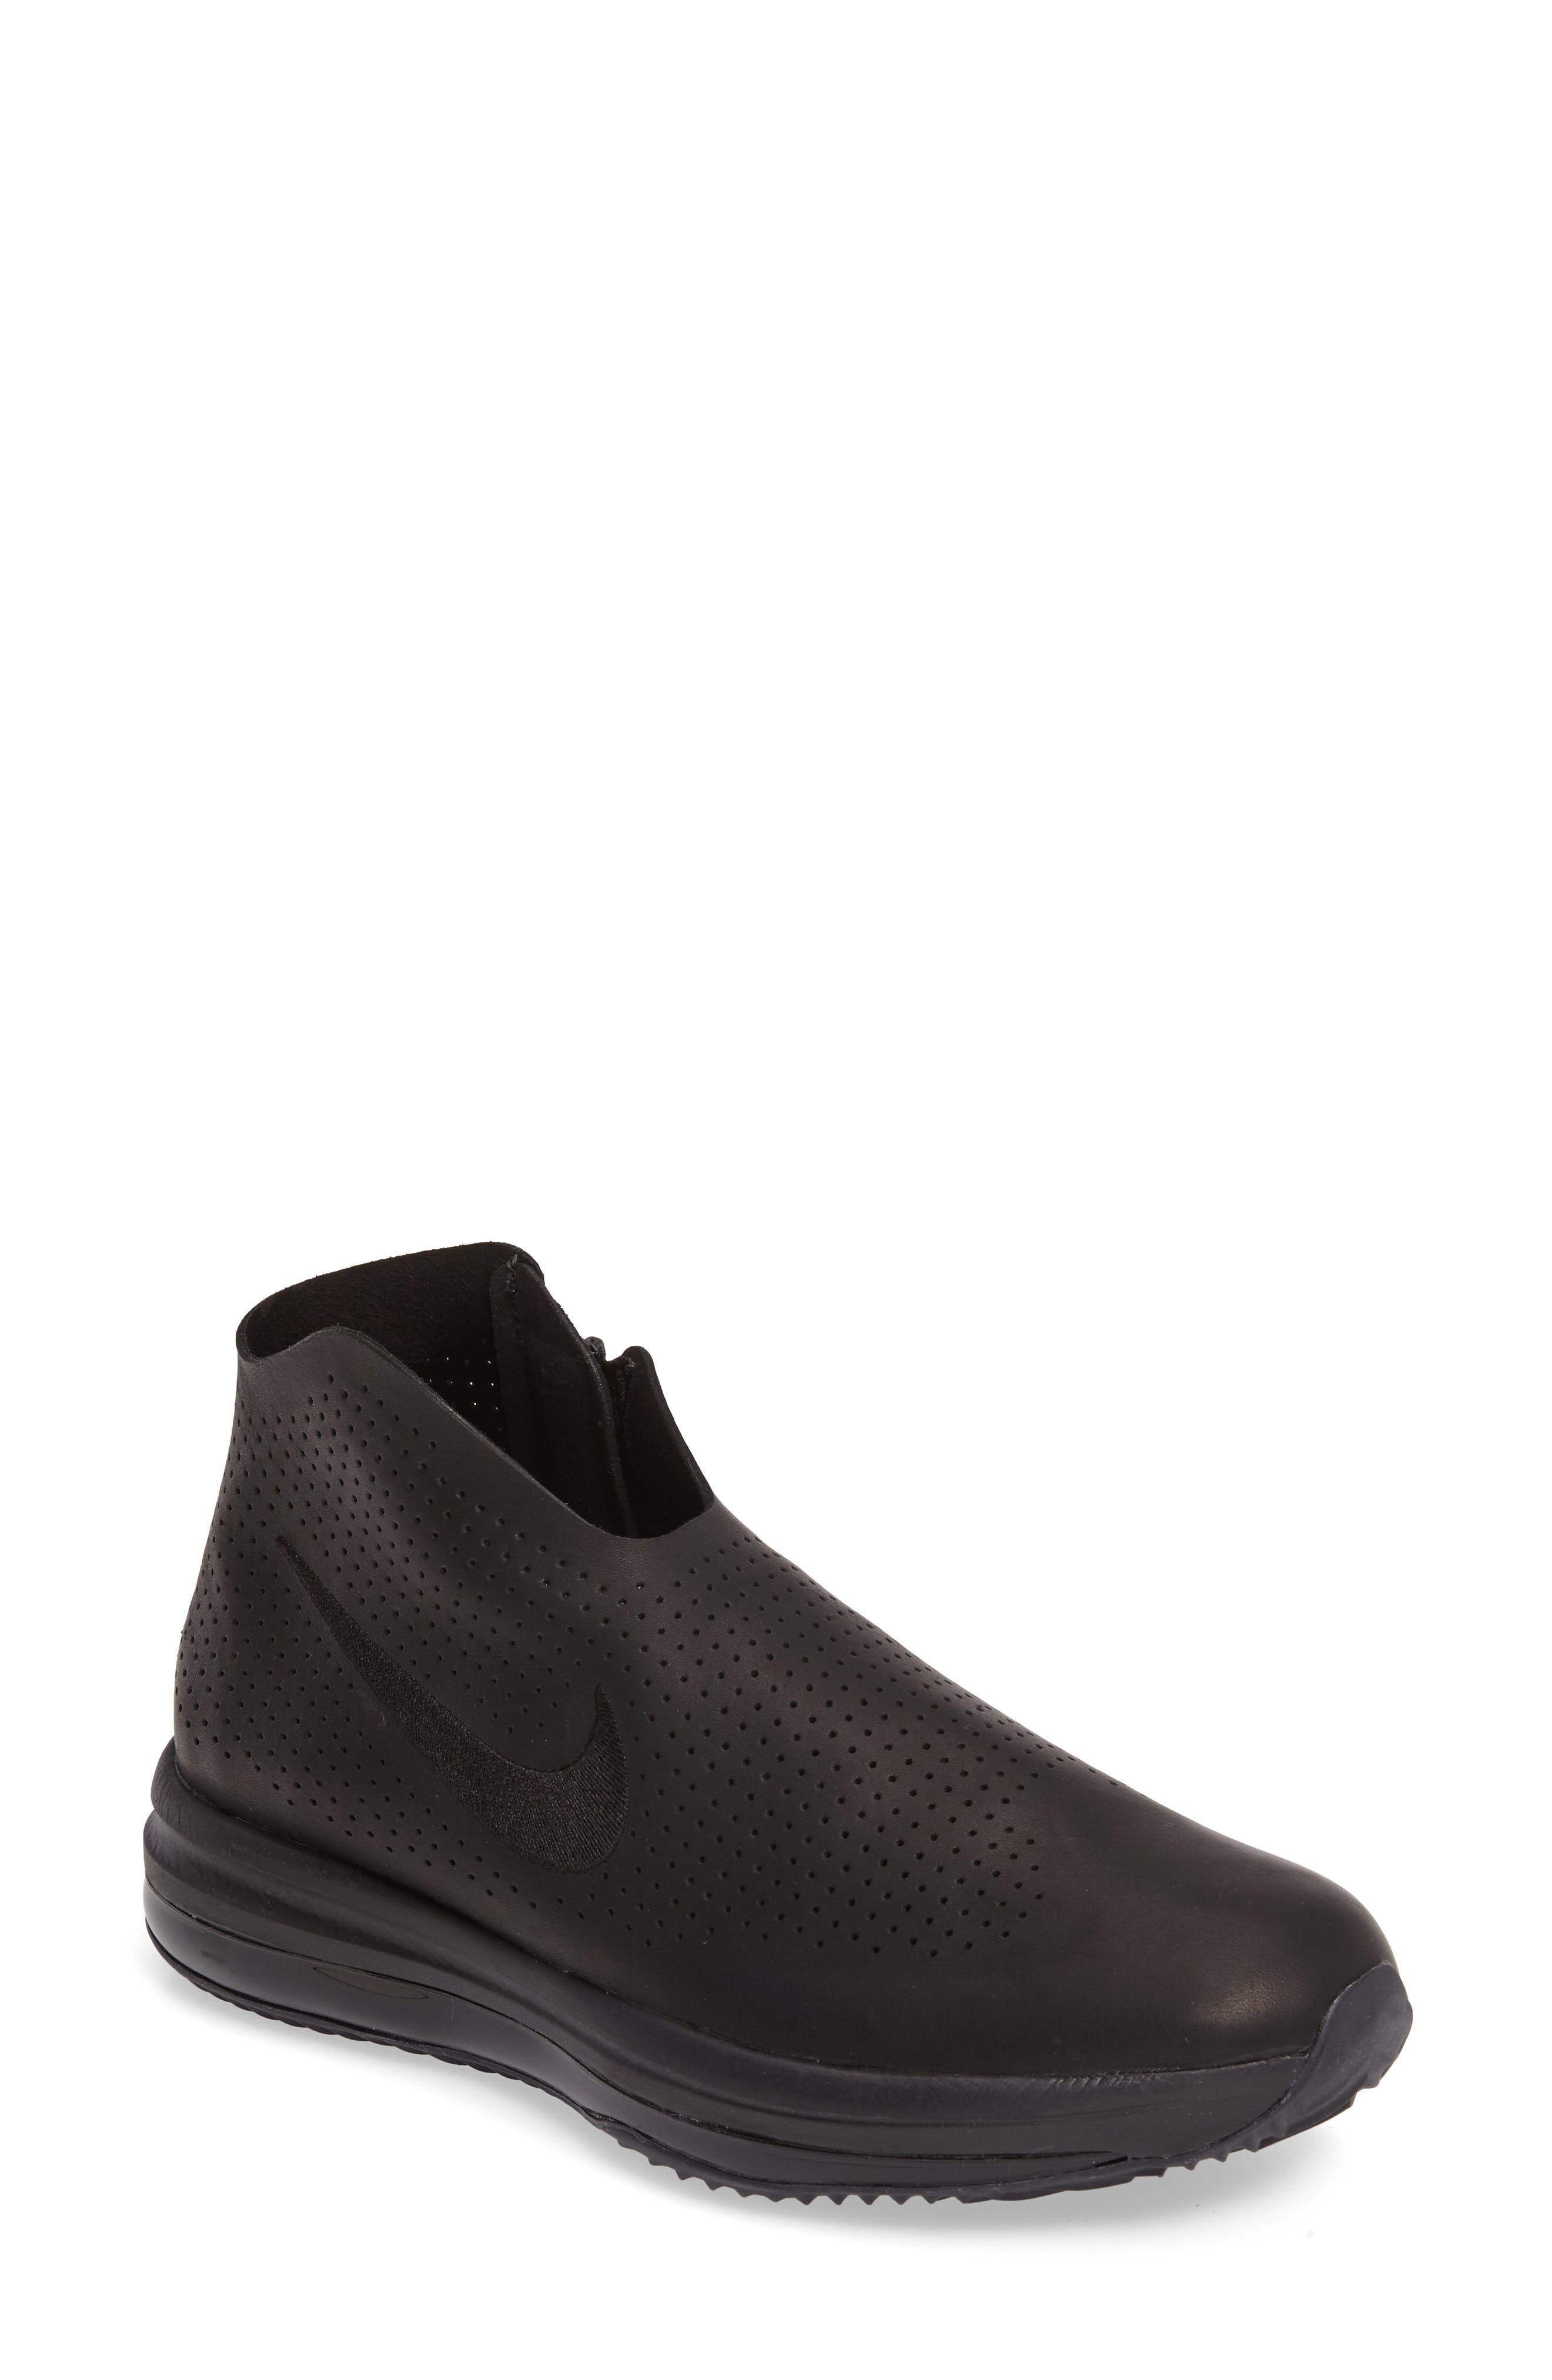 NIKE Zoom Modarina Mid-Top Sneaker